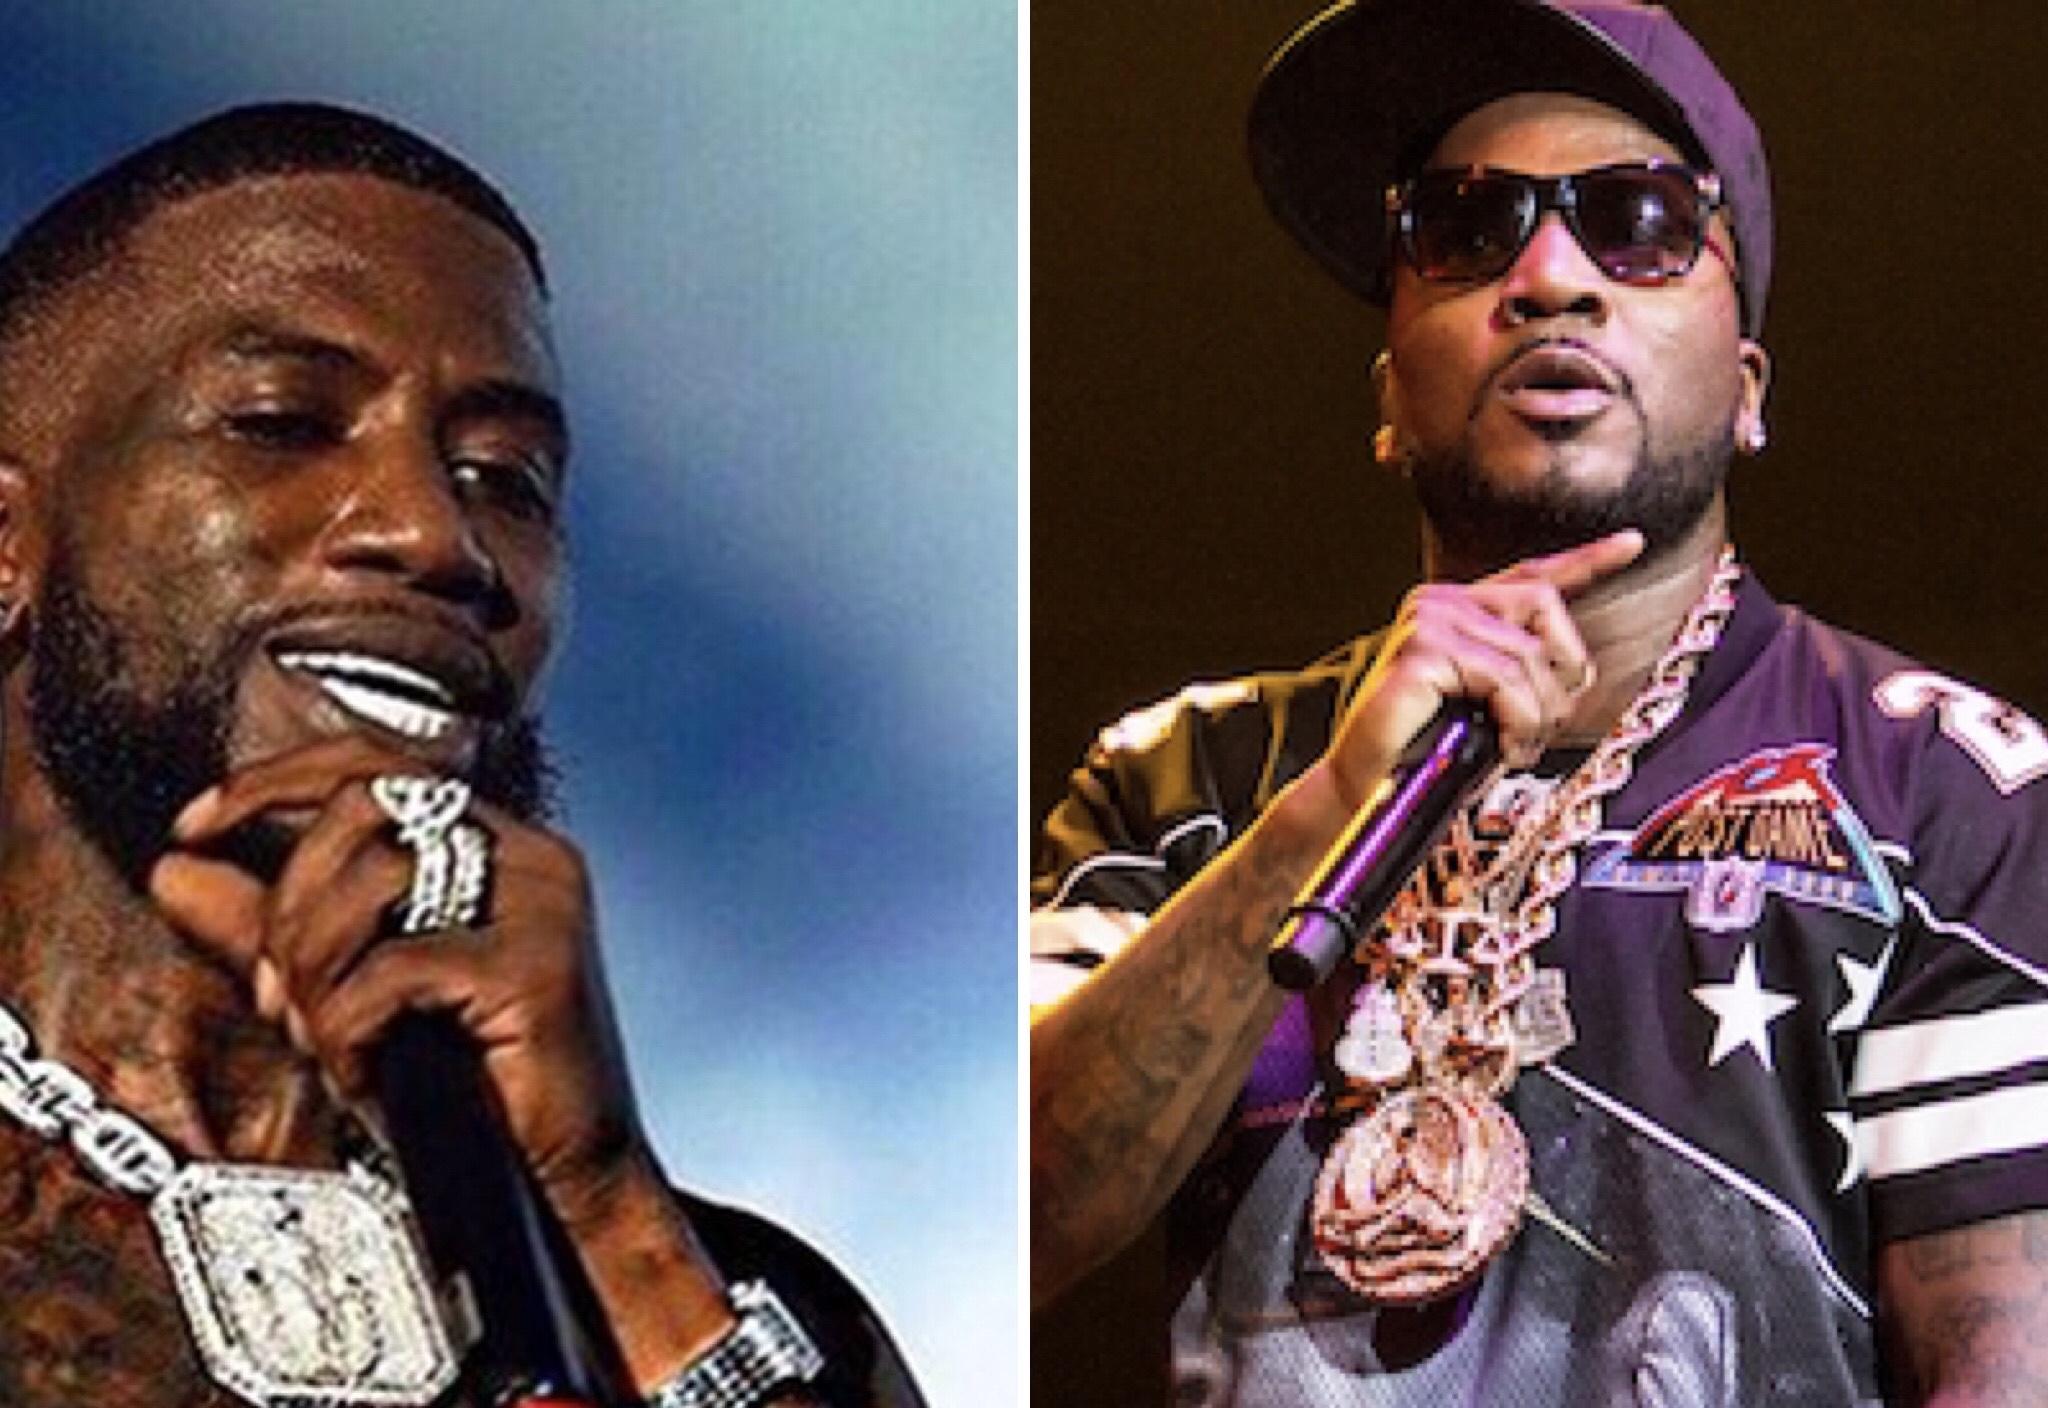 Twitter Reacts To Jeezy Vs Gucci Mane 'Verzuz' Battle